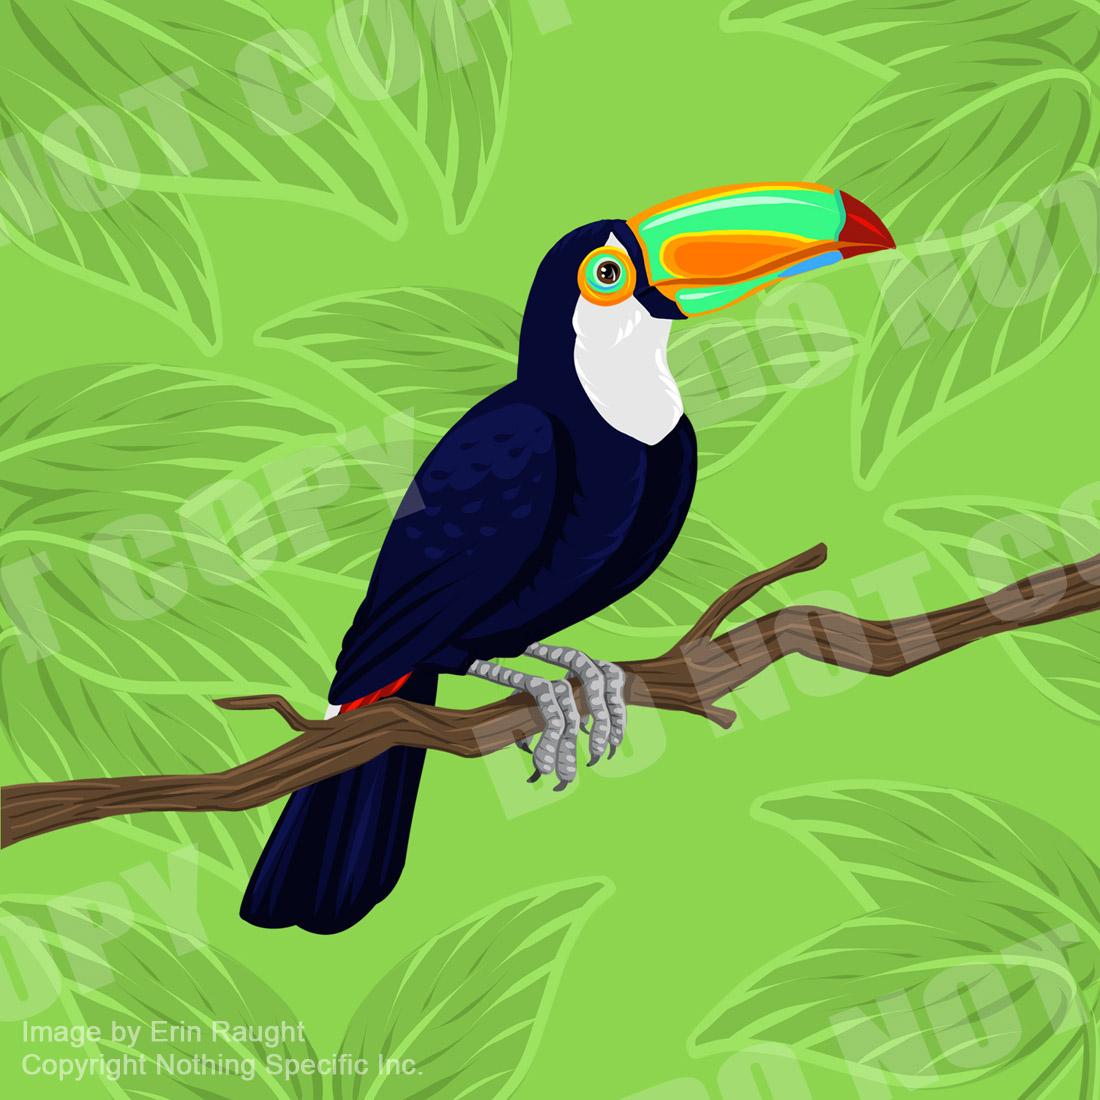 7463 - Toucan - Jungle Parrot Bird Tropical.jpg